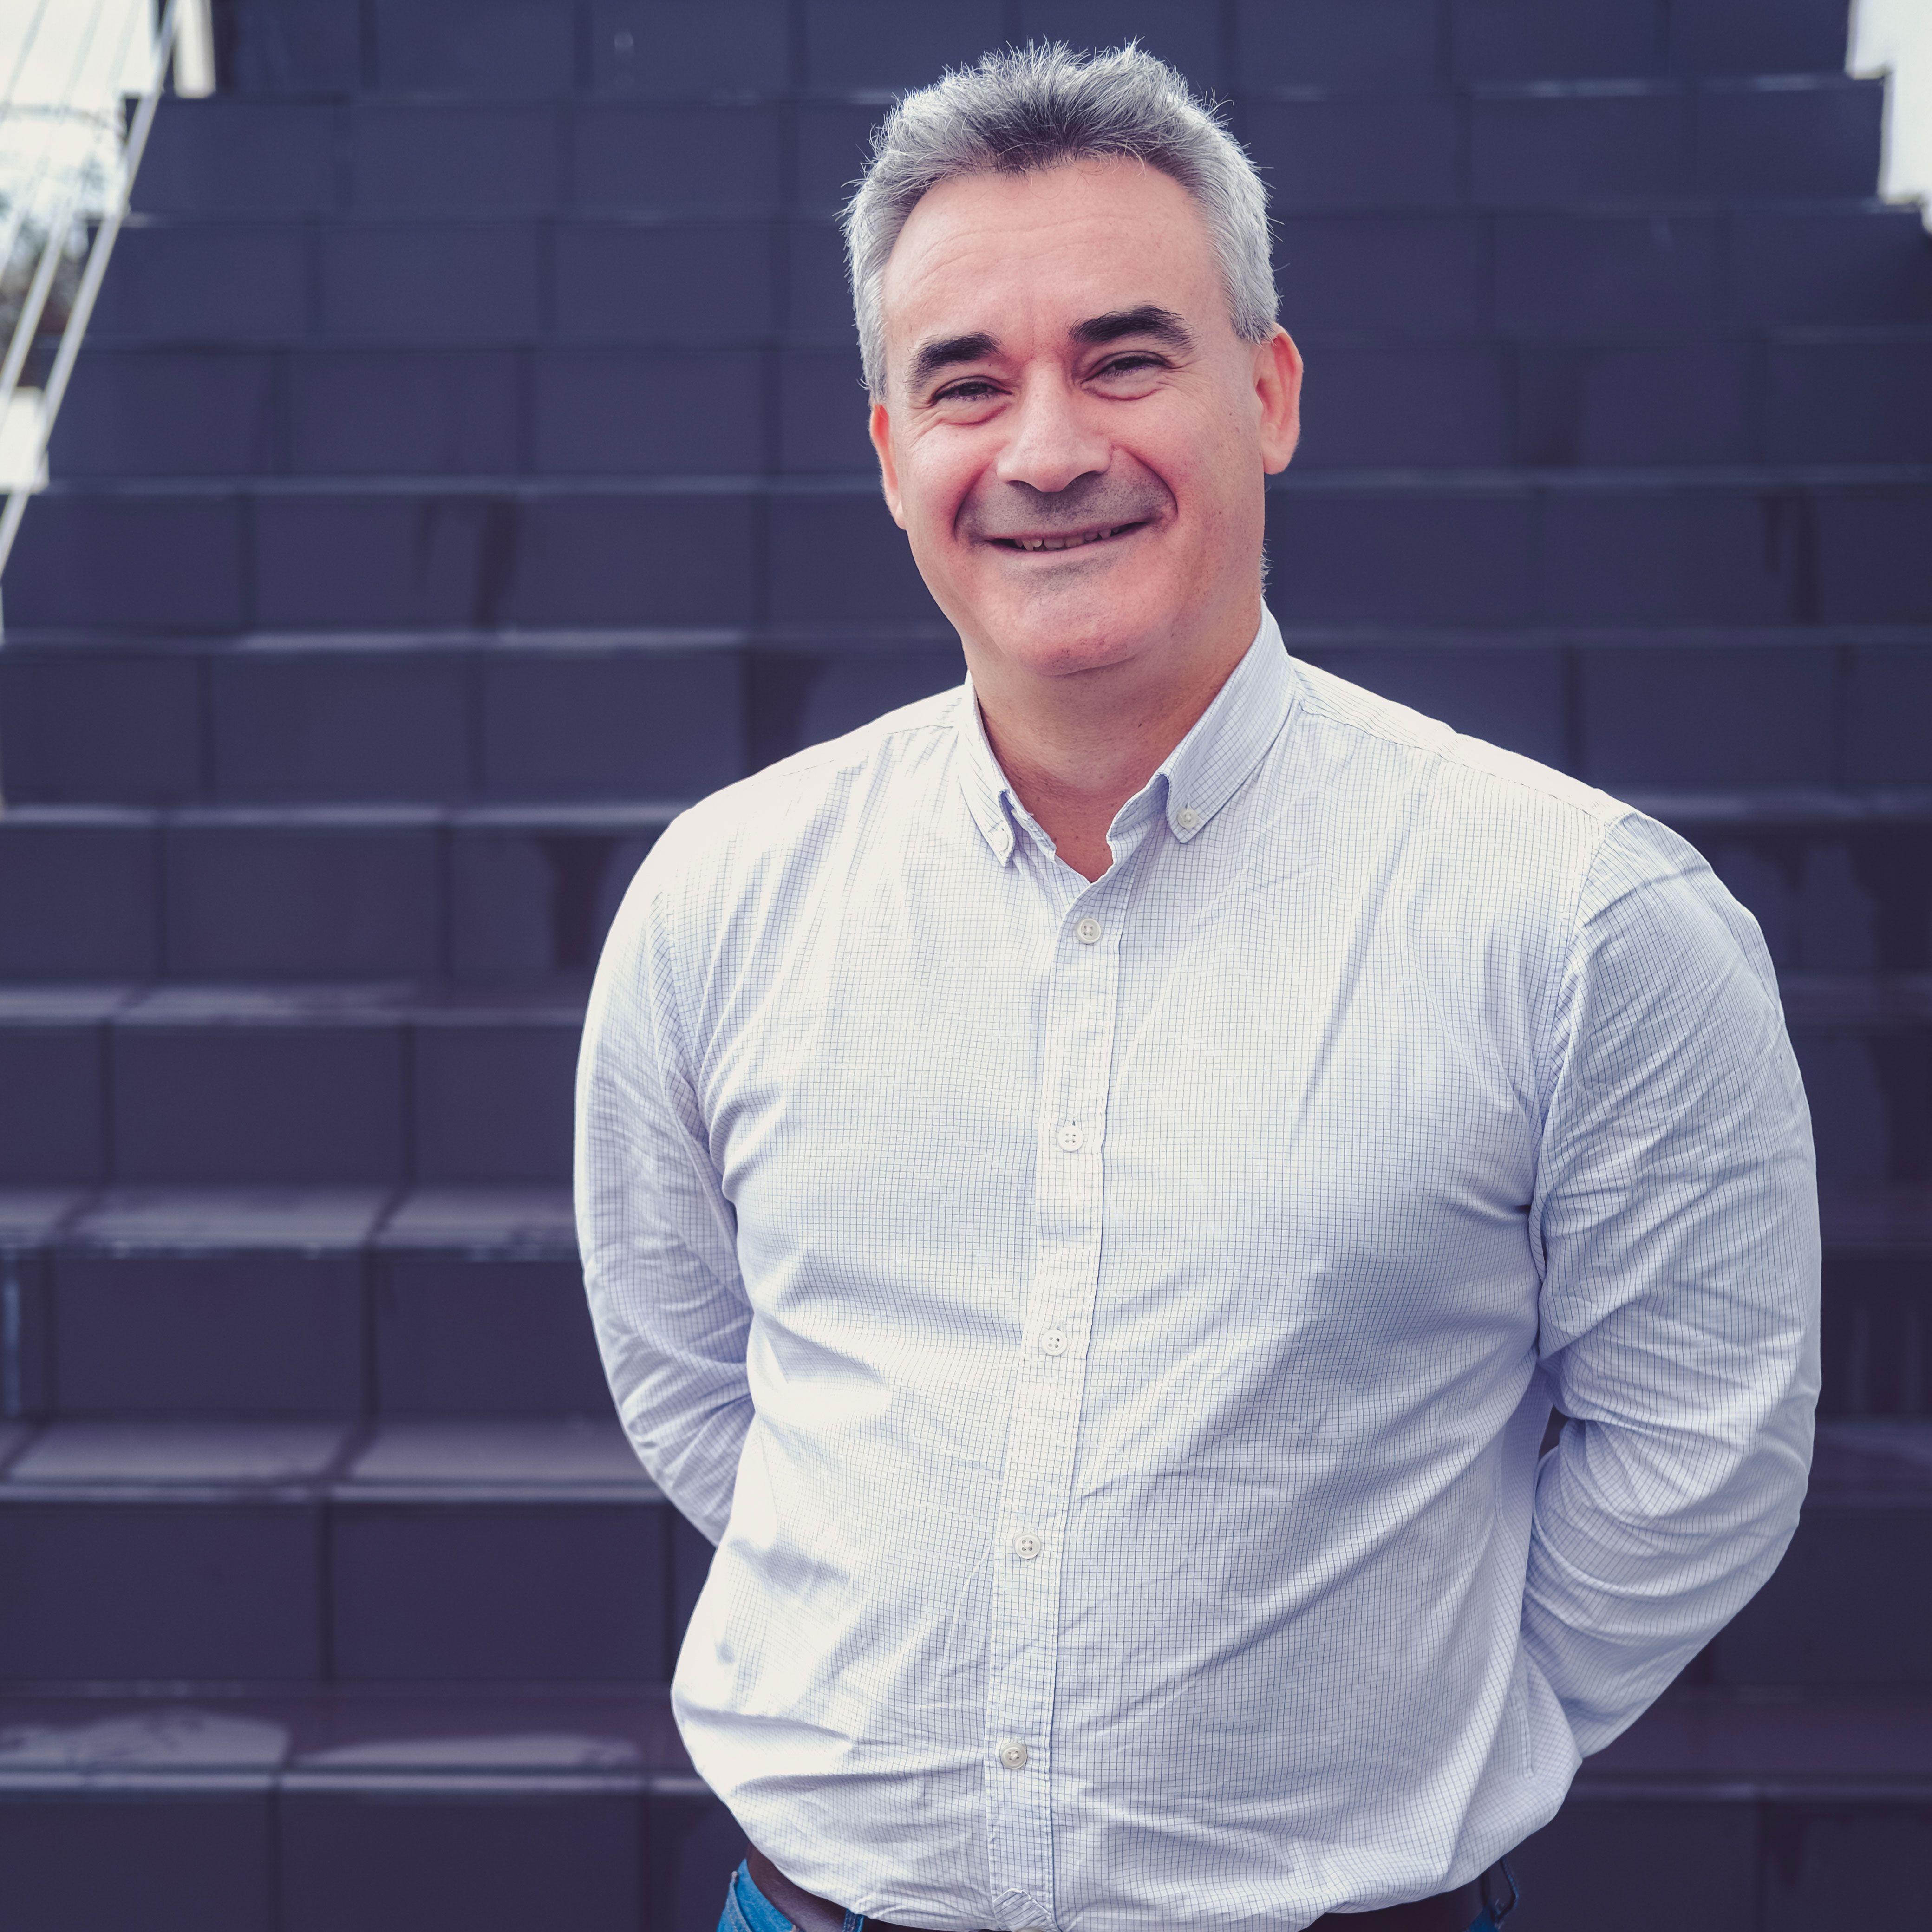 Benjamim  Cardoso - Platoon Manager